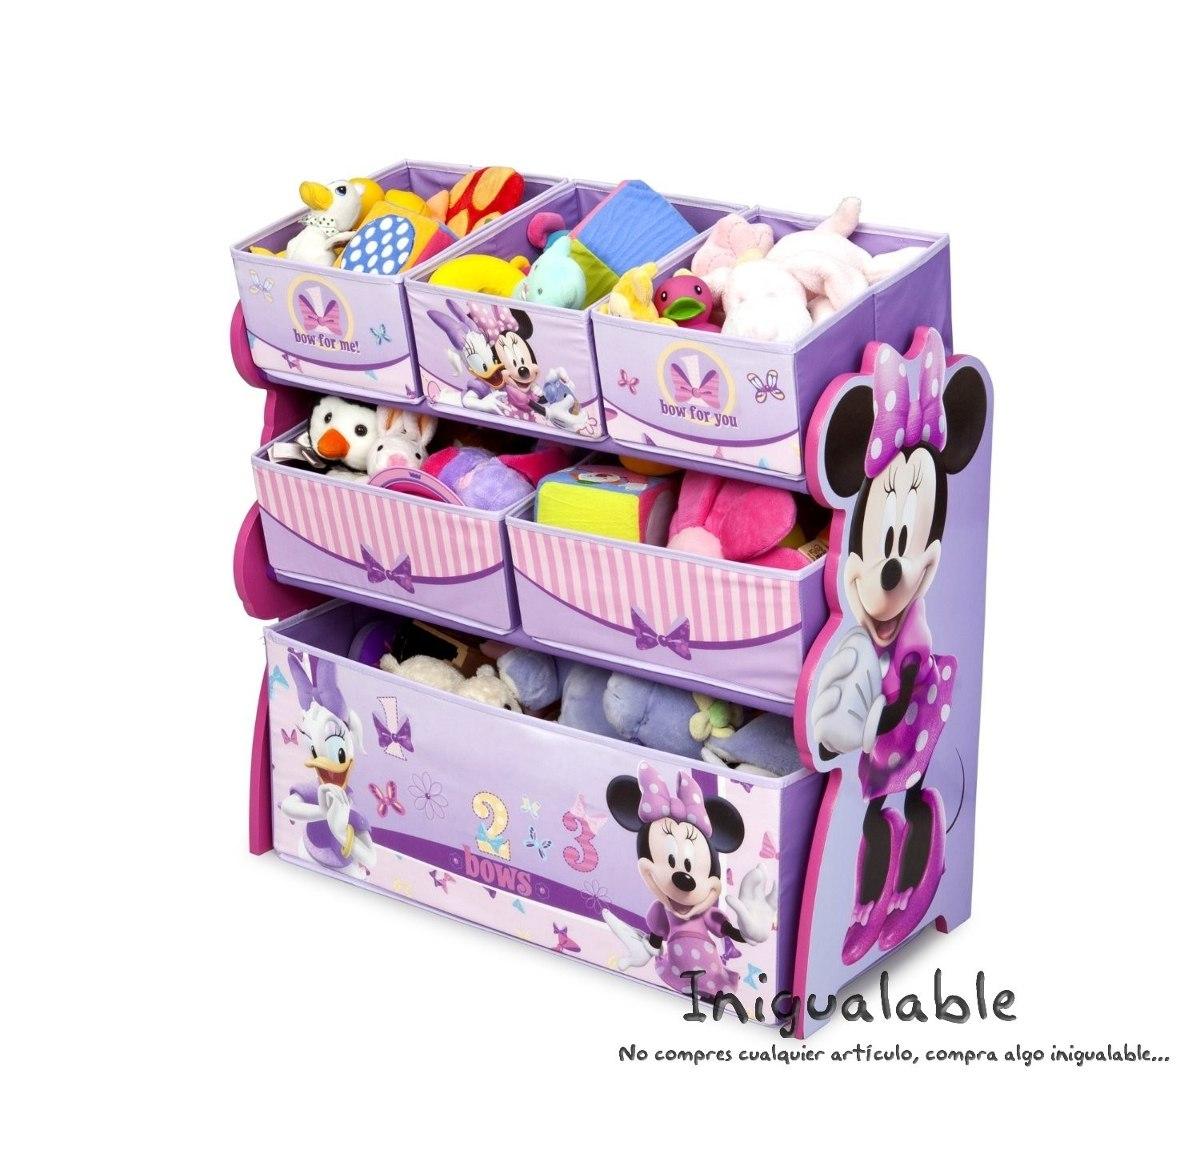 Organizador de juguetes para ni as de minnie mouse - Cosas para guardar juguetes ...